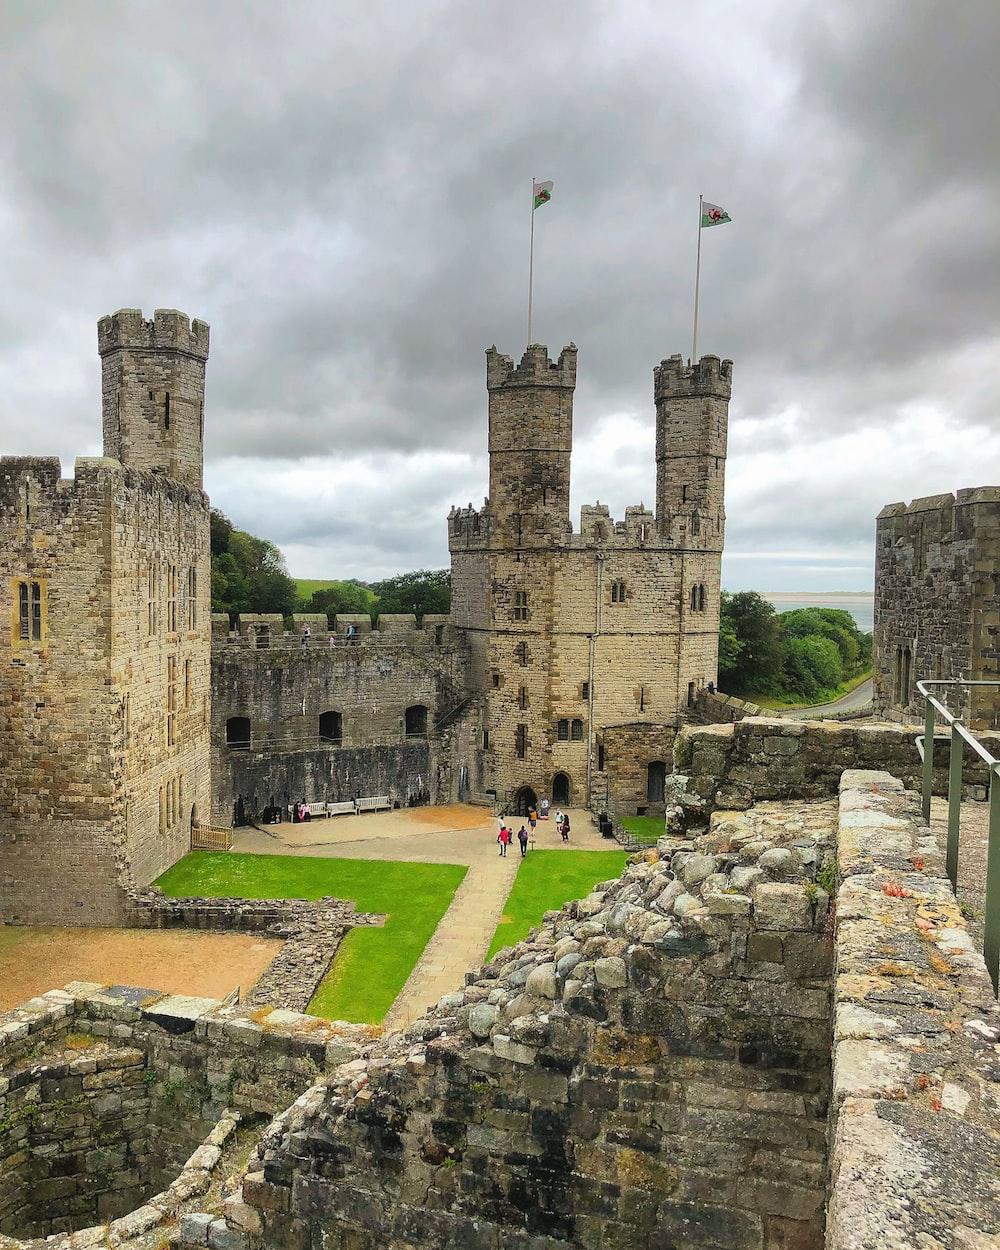 gray concrete castle under gray sky